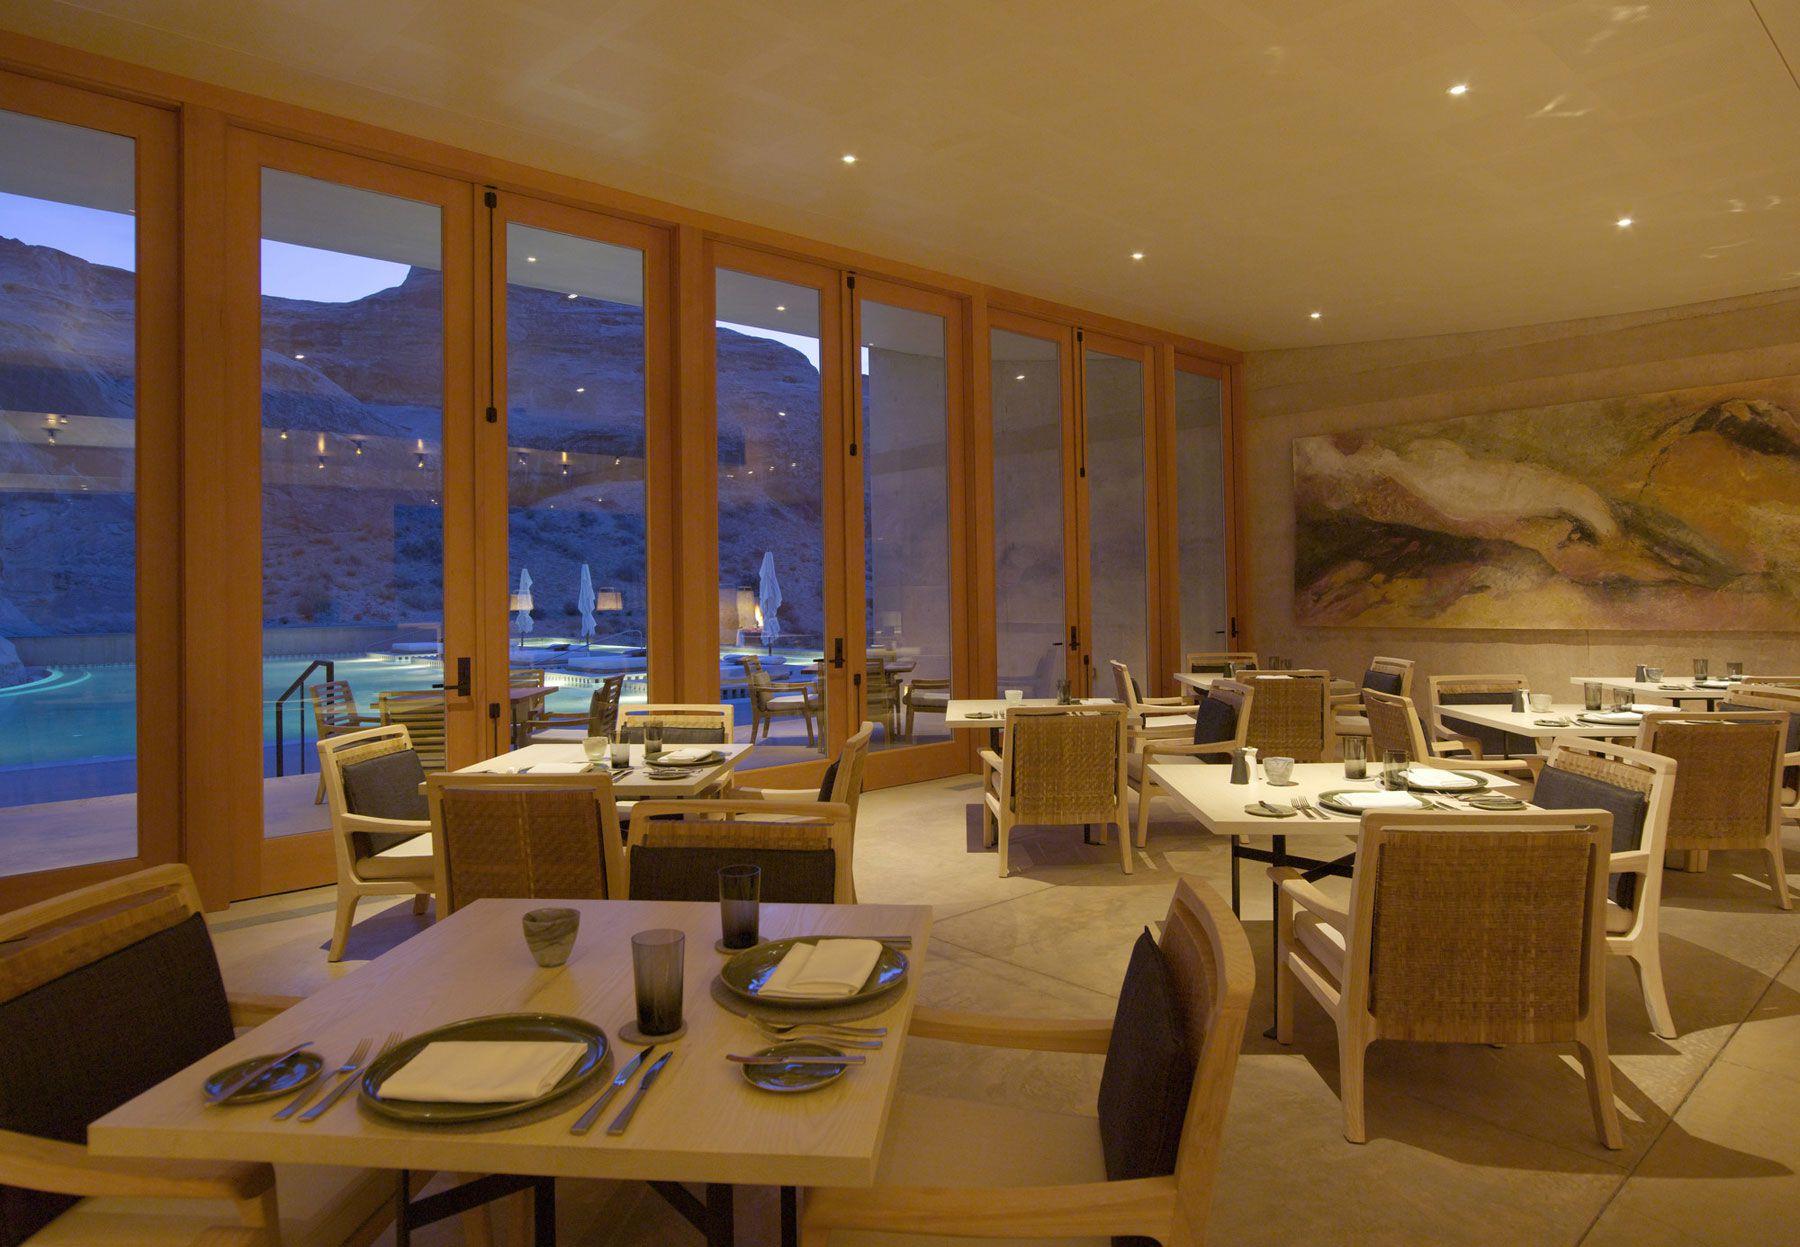 Amangiri-Luxury-Resort-Hotel-in-Canyon-Point-15